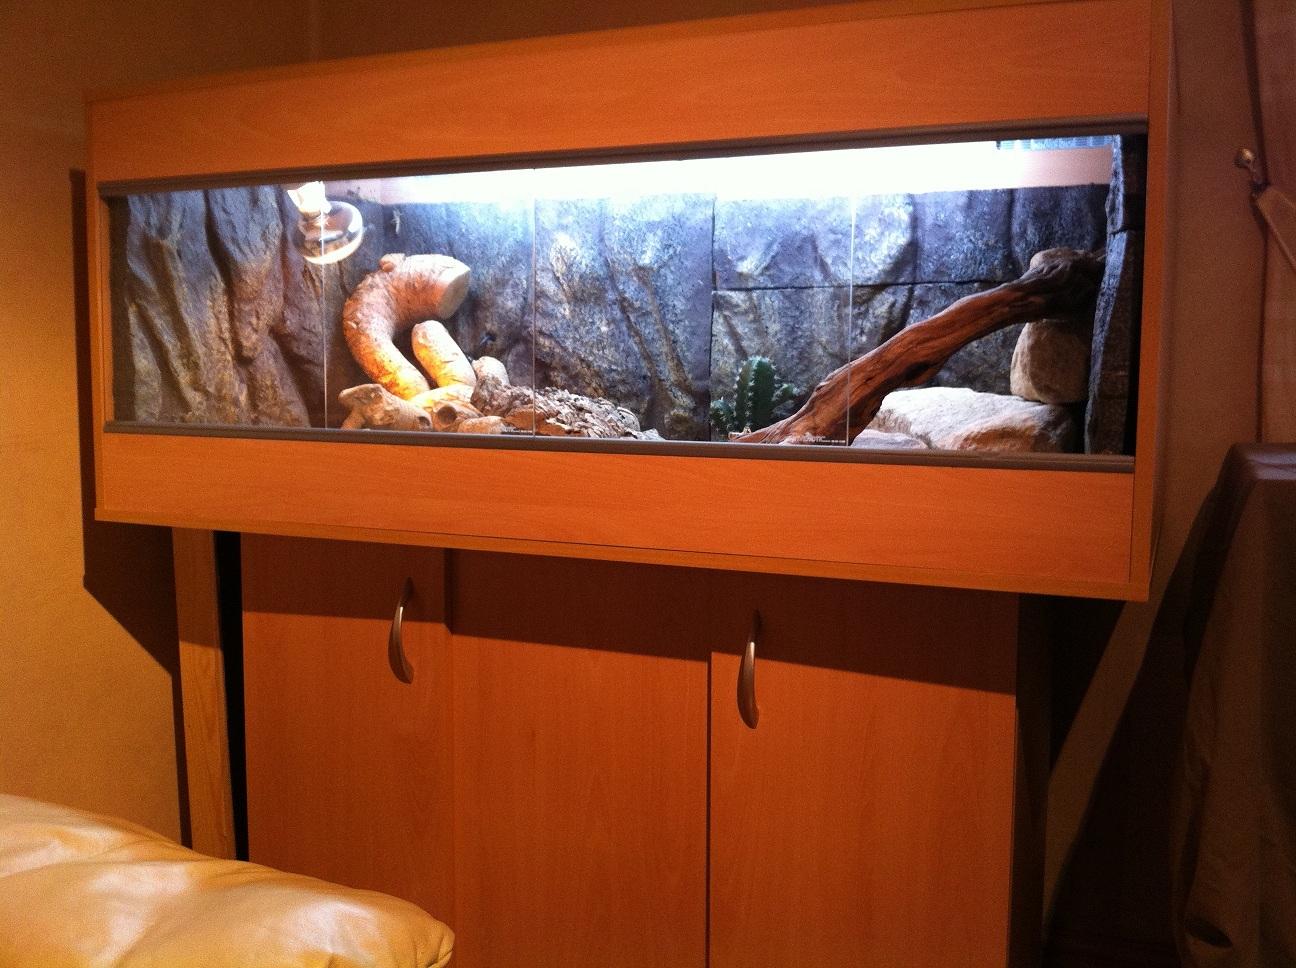 Scotland Bearded Dragon Amp 4 Foot Viv For Sale Reptile Forums